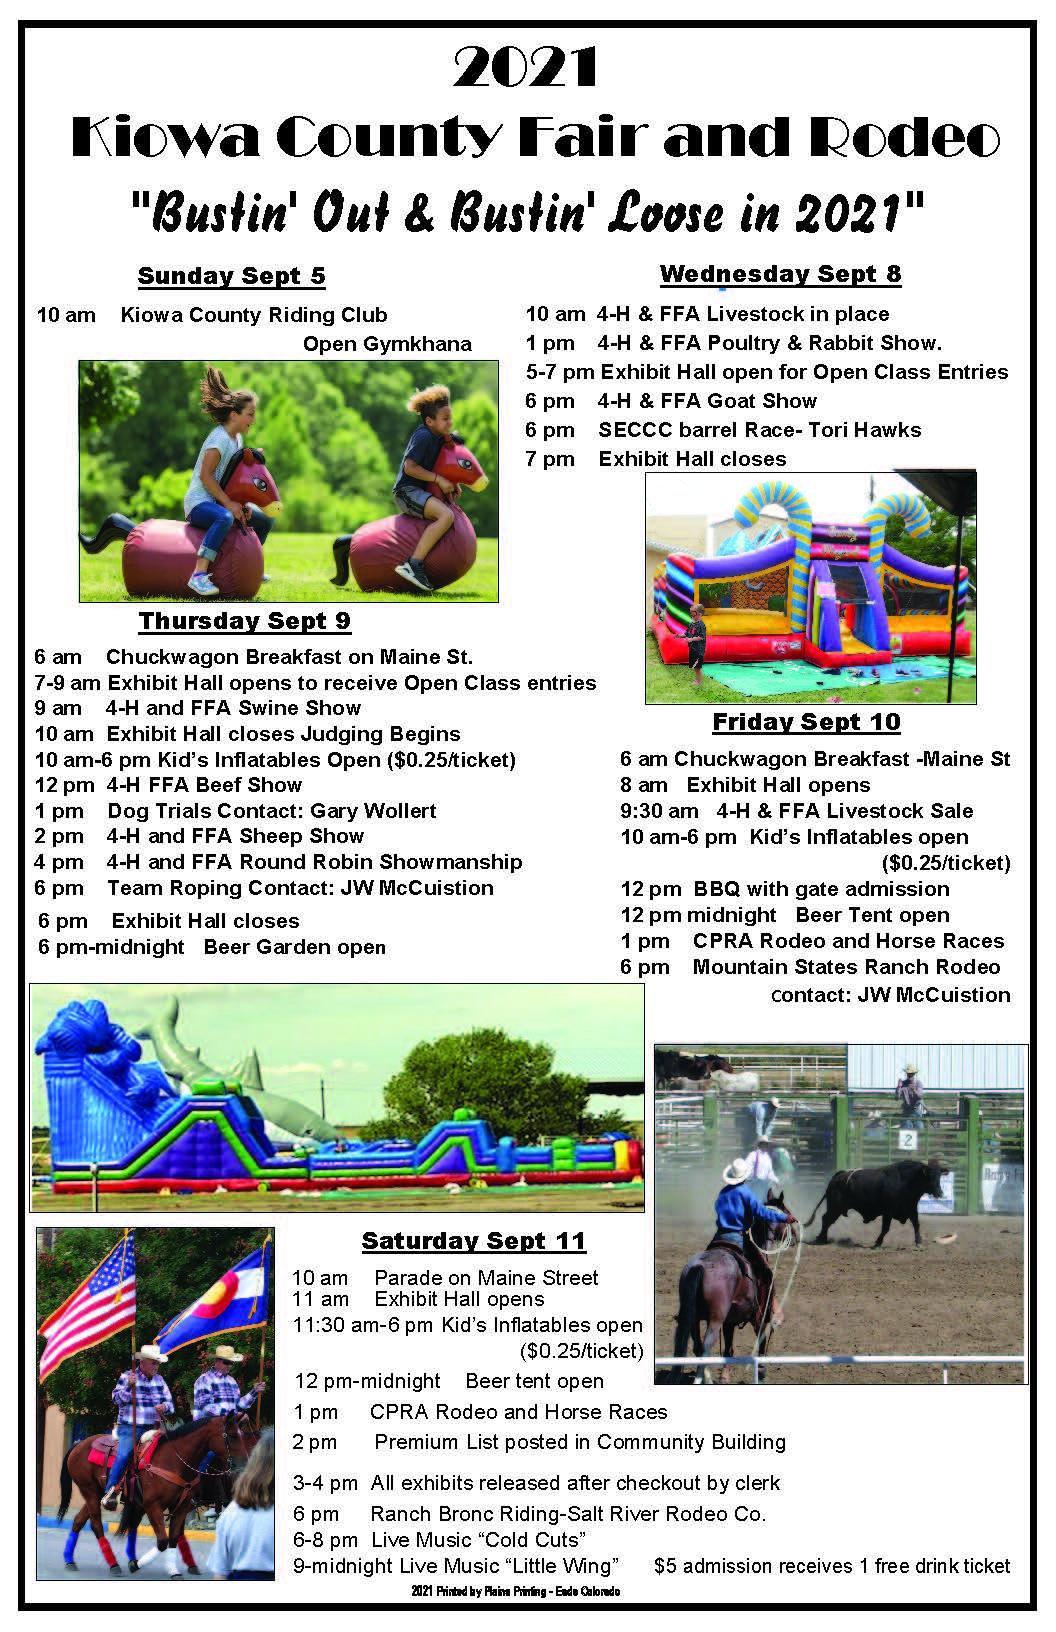 POSTER 2021 Kiowa County Fair events schedule